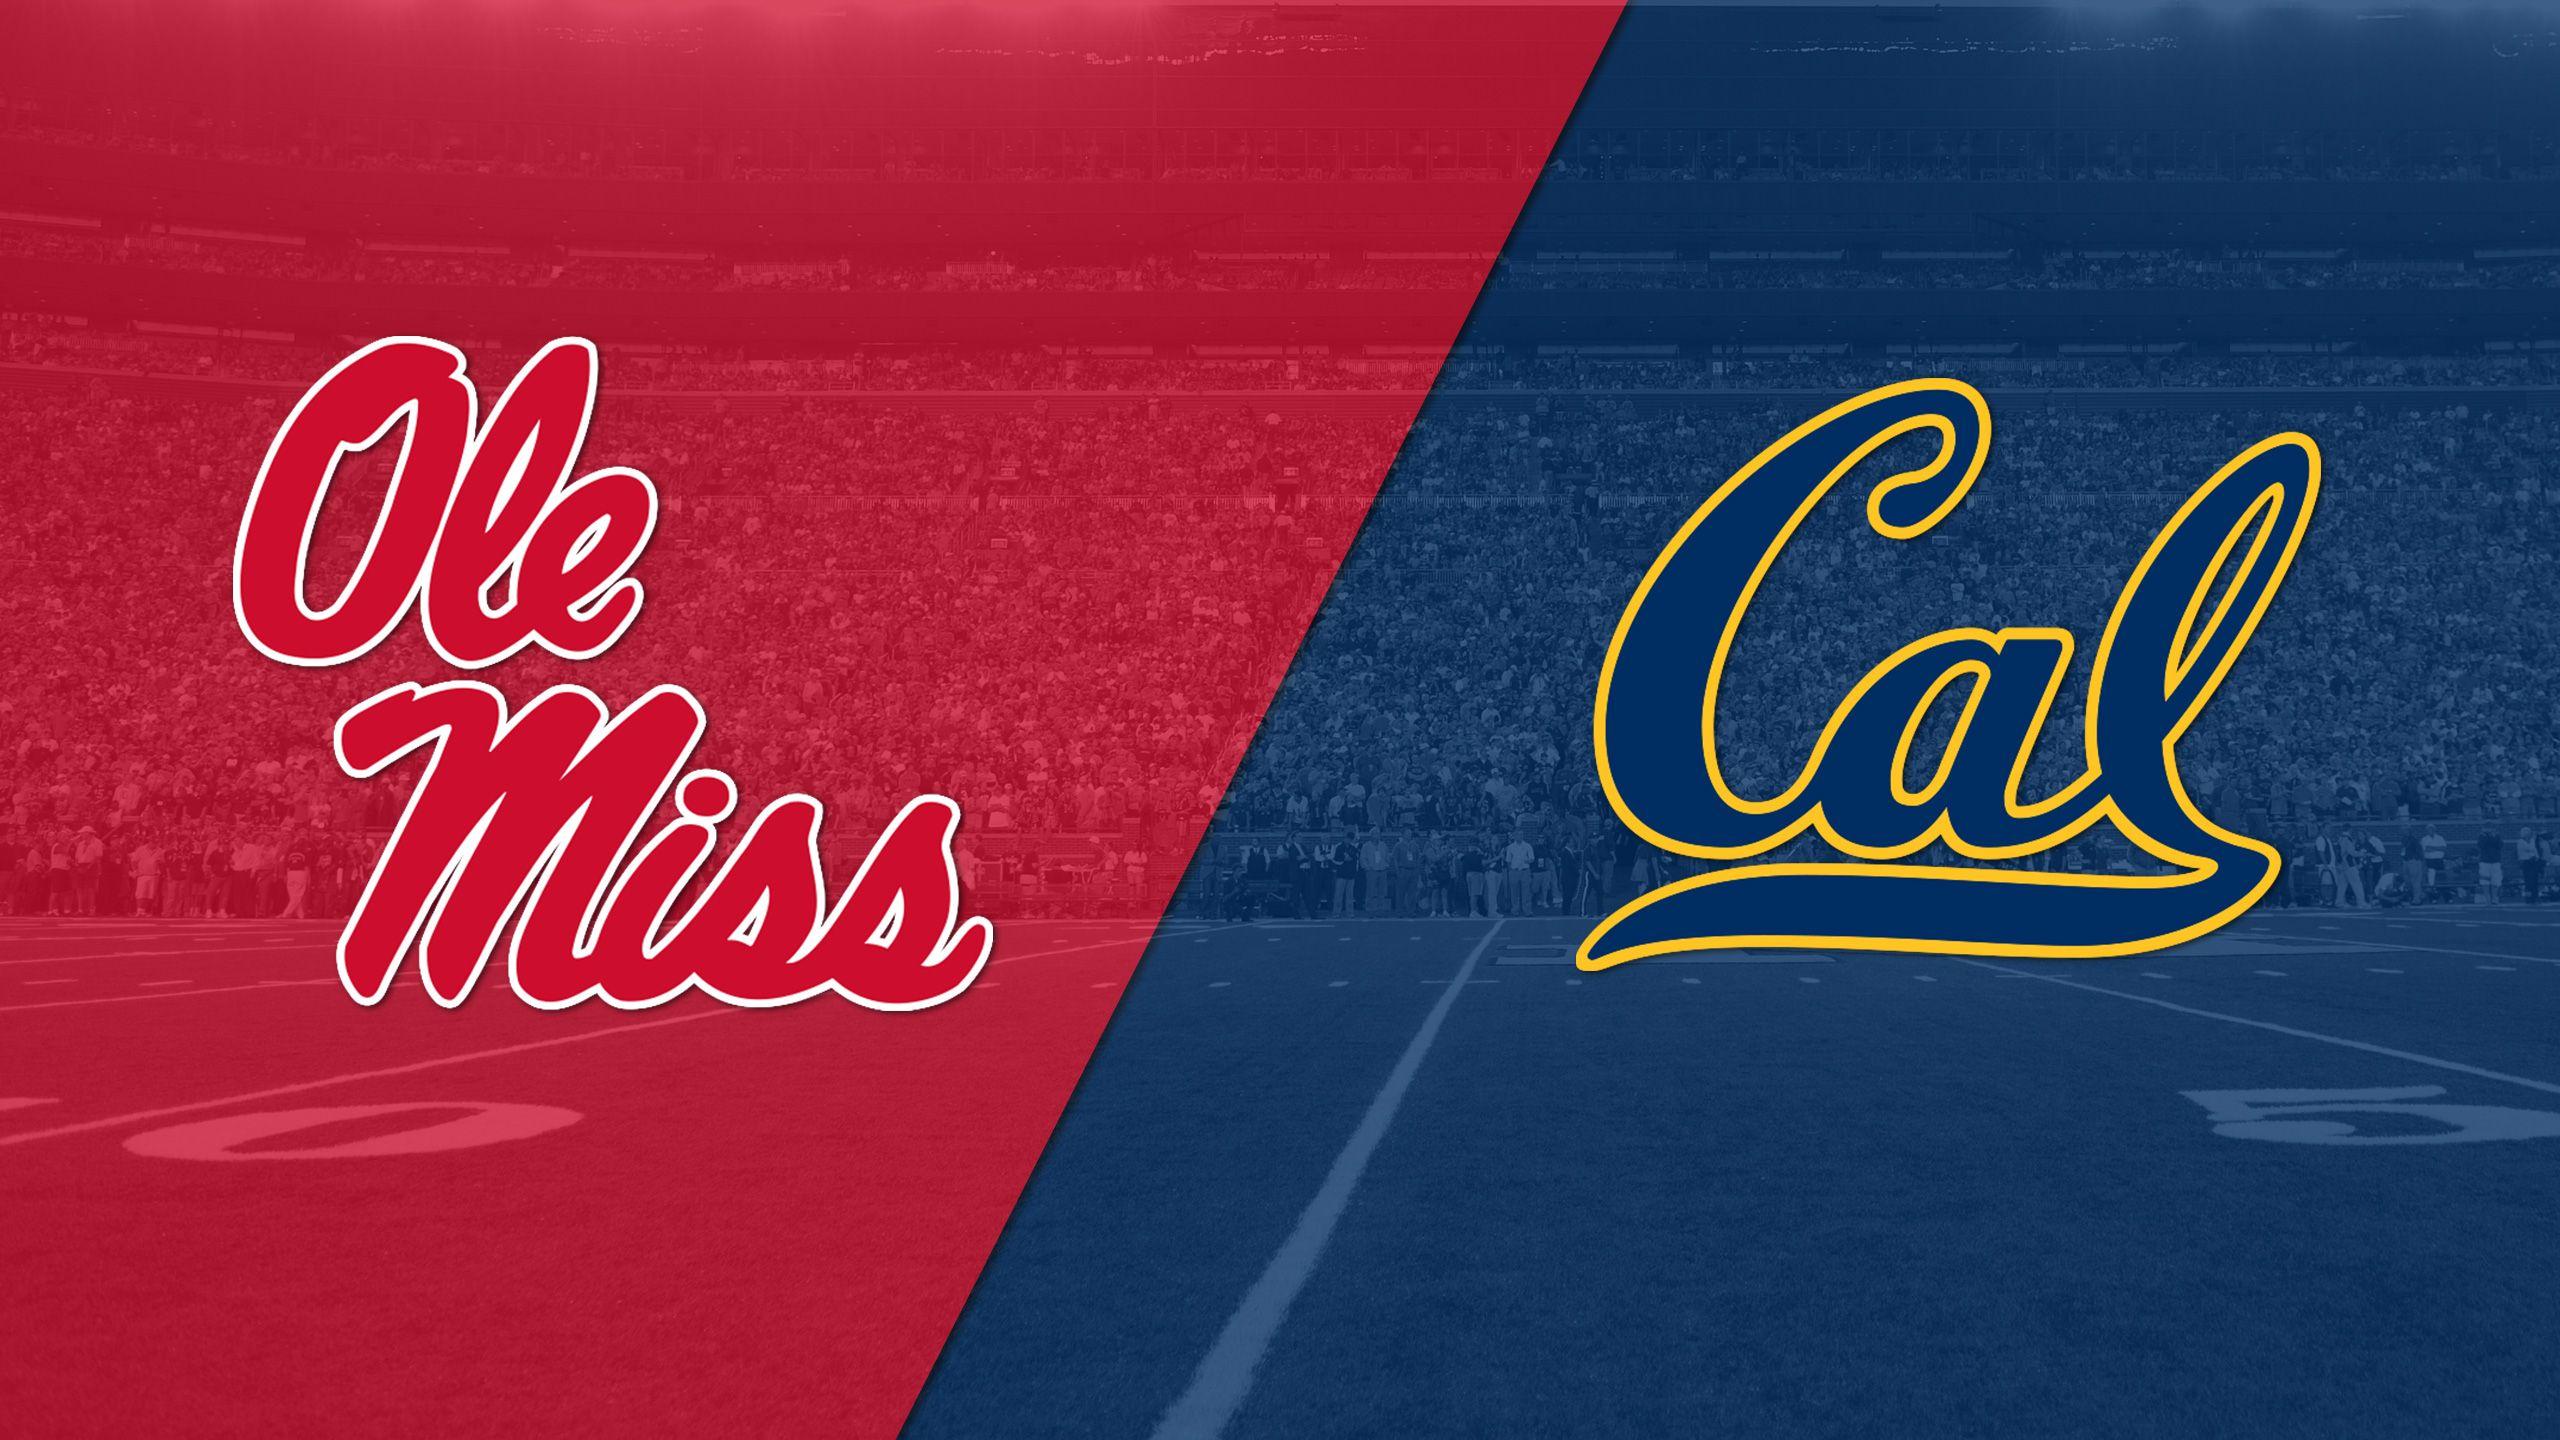 In Spanish - Ole Miss vs. California (Football)